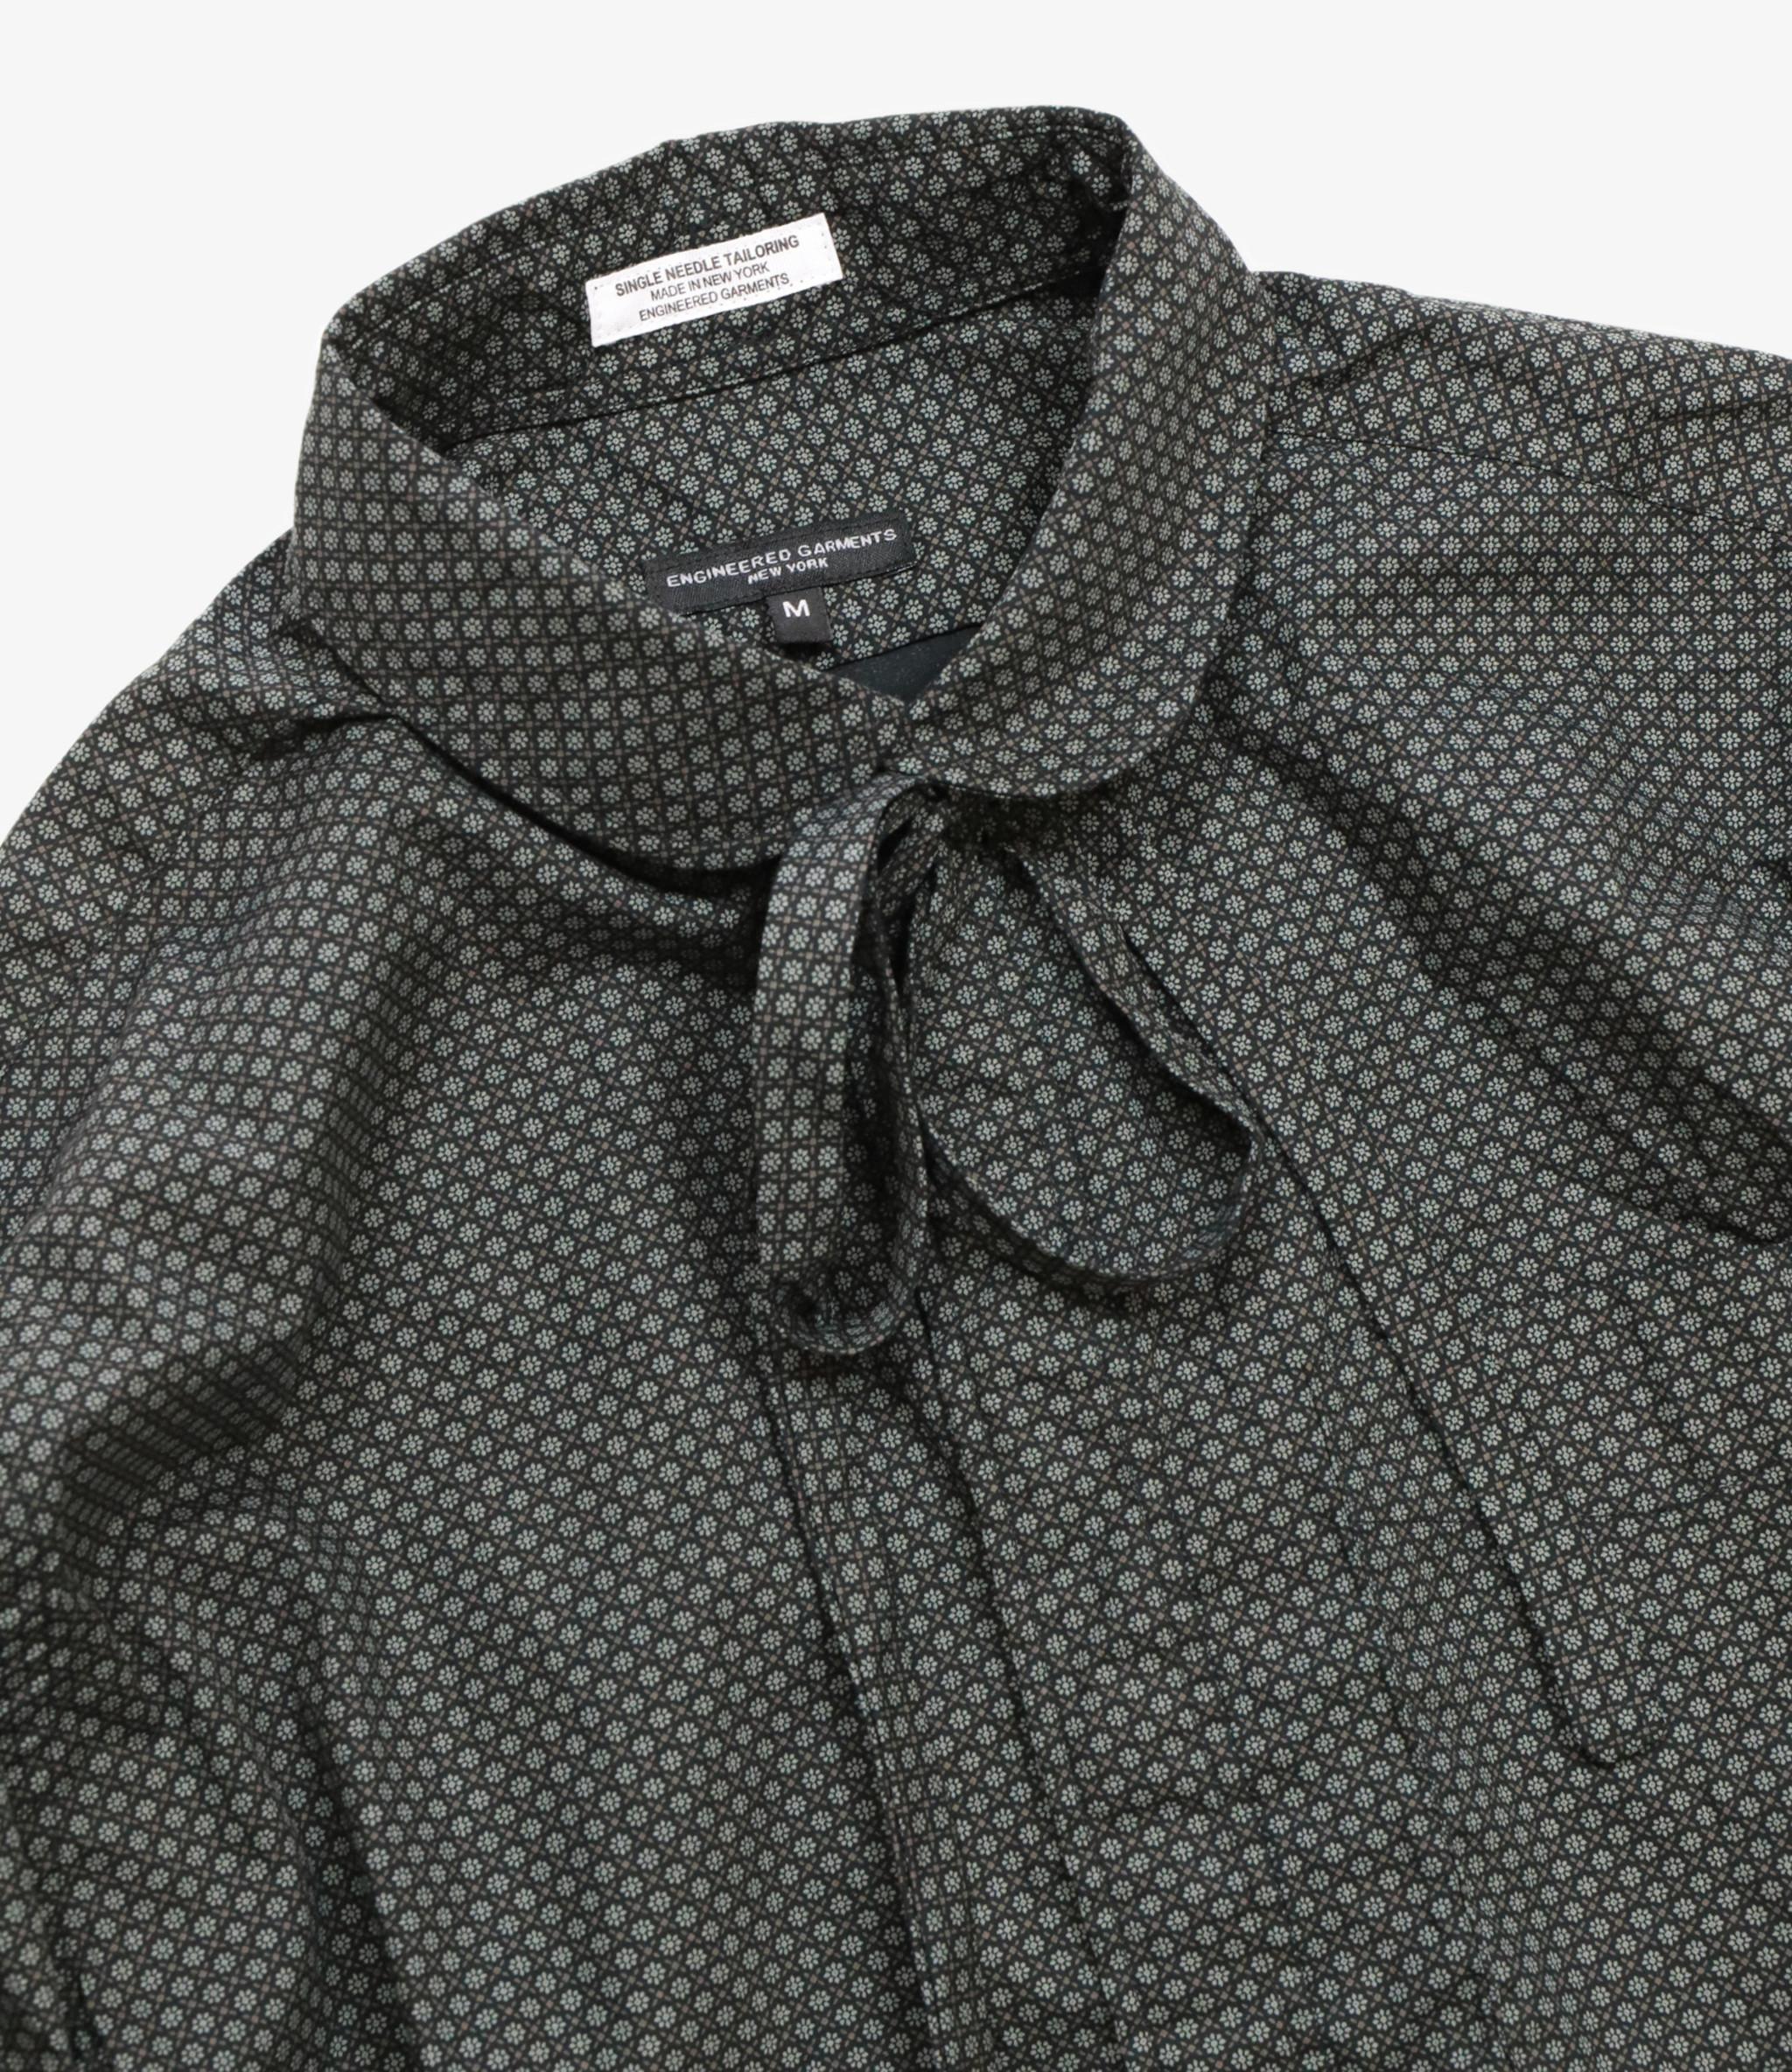 Engineered Garments Rounded Collar Shirt - Black Cotton Mini Foulard